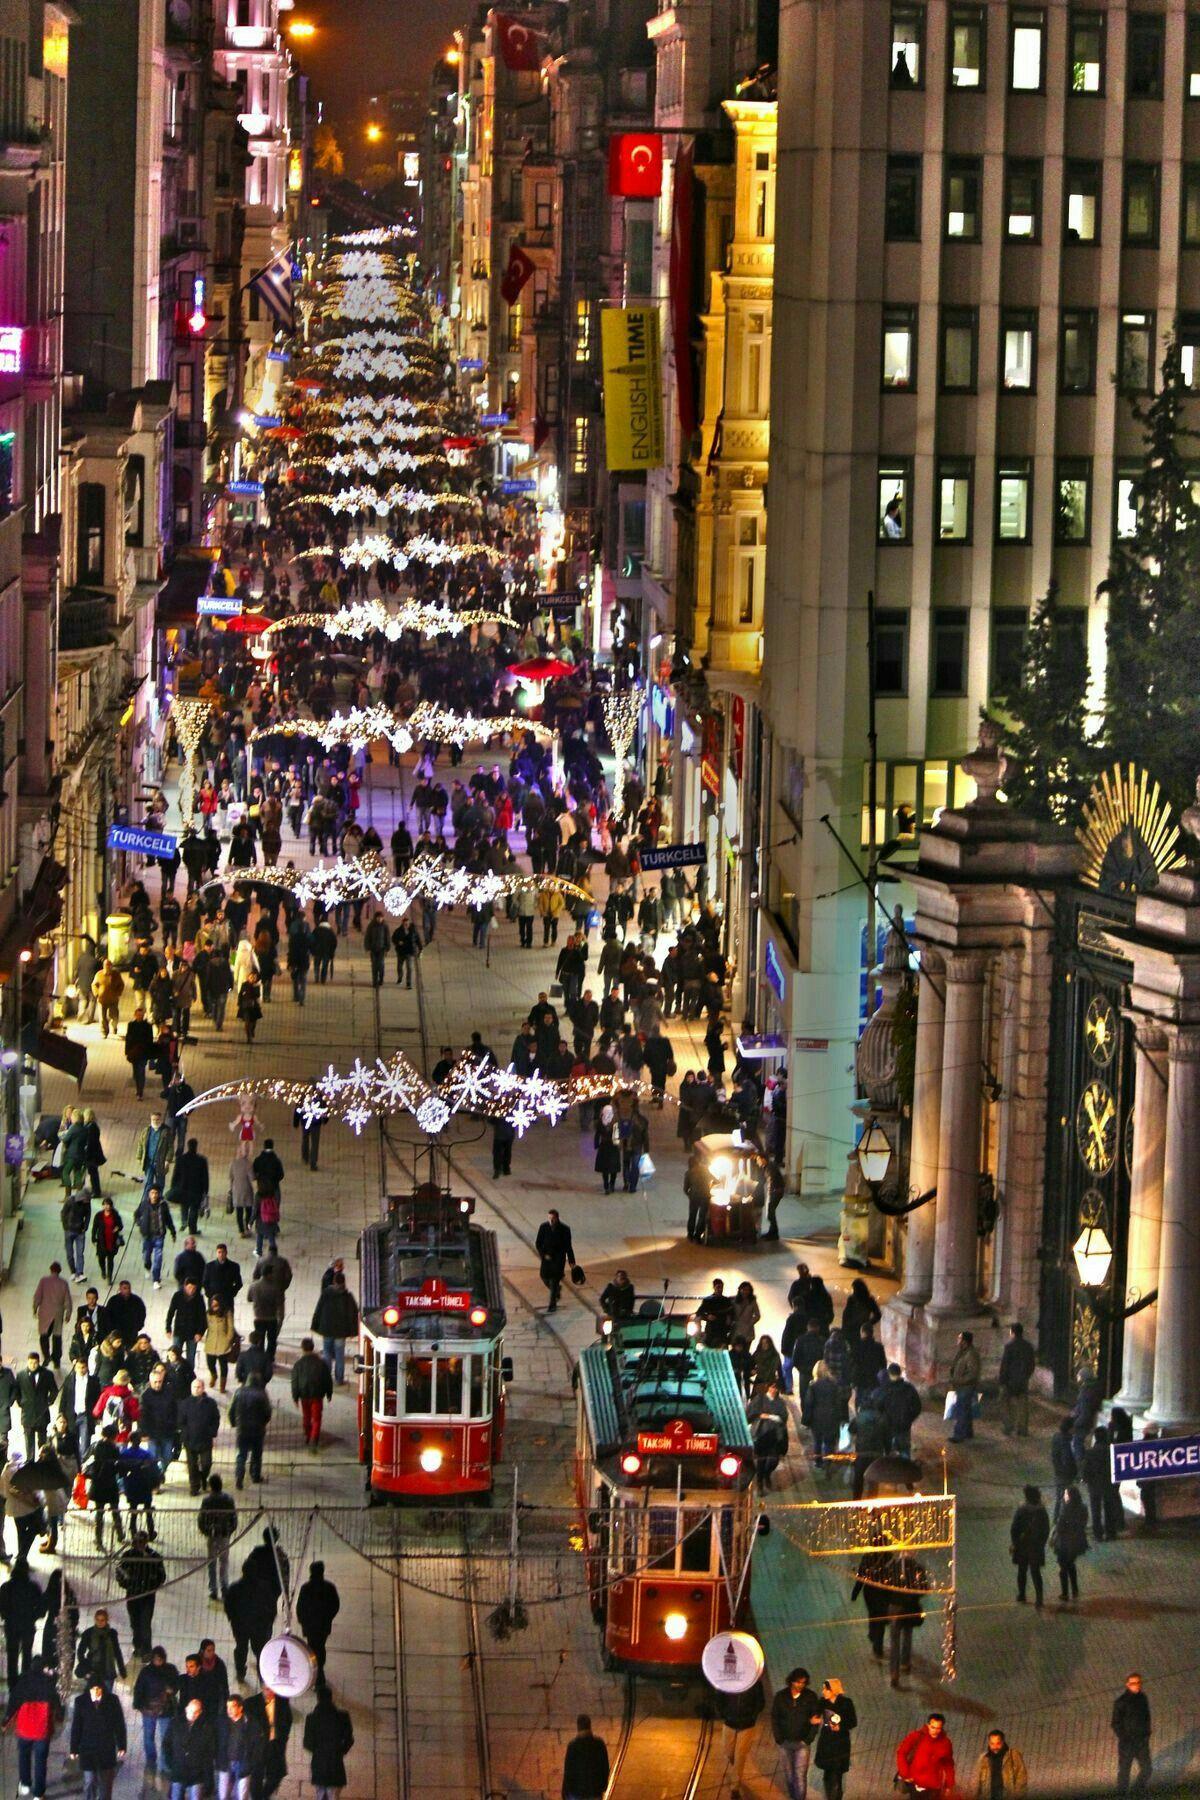 taksim-istiklal-beyoğlu İstanbul/turkey | istanbul | pinterest, Einladung